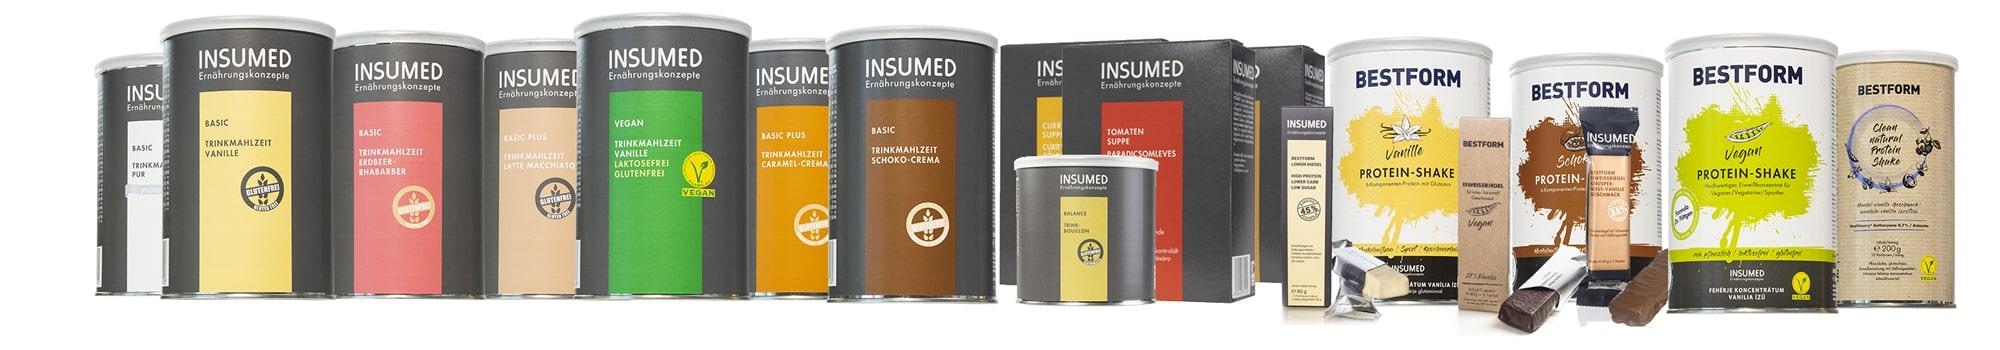 Banner Produktpalette Insumed